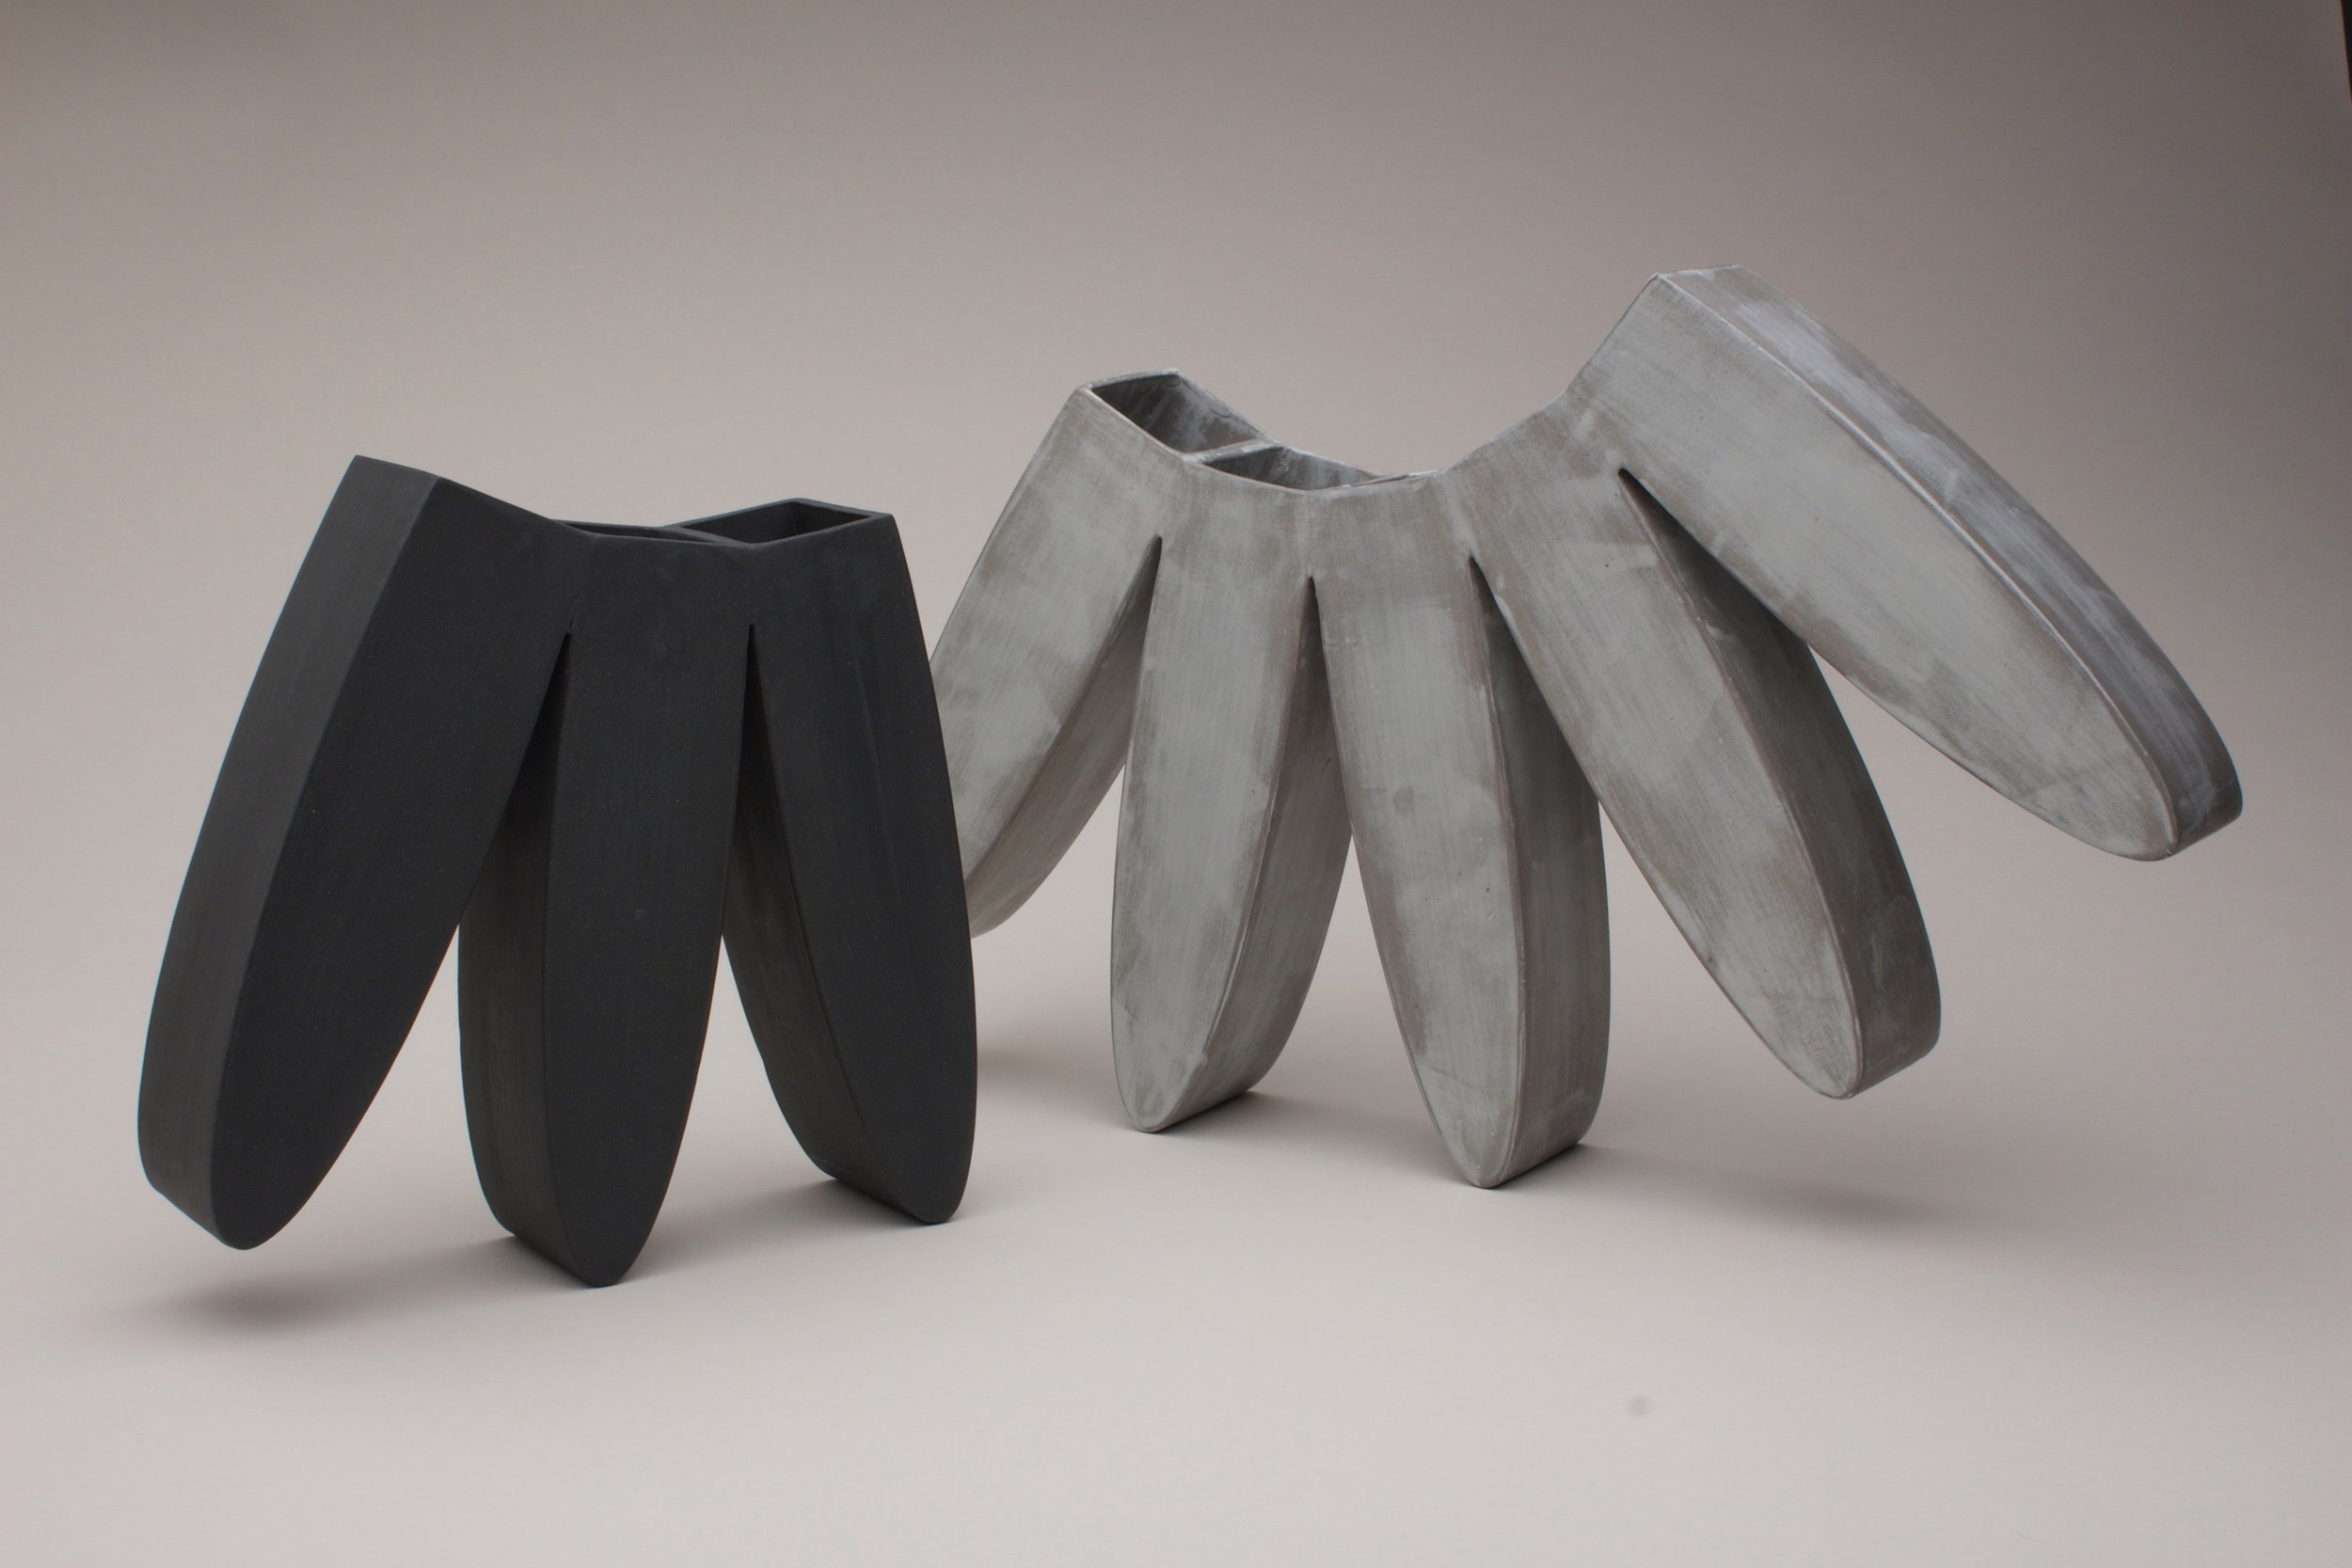 Gear Vases